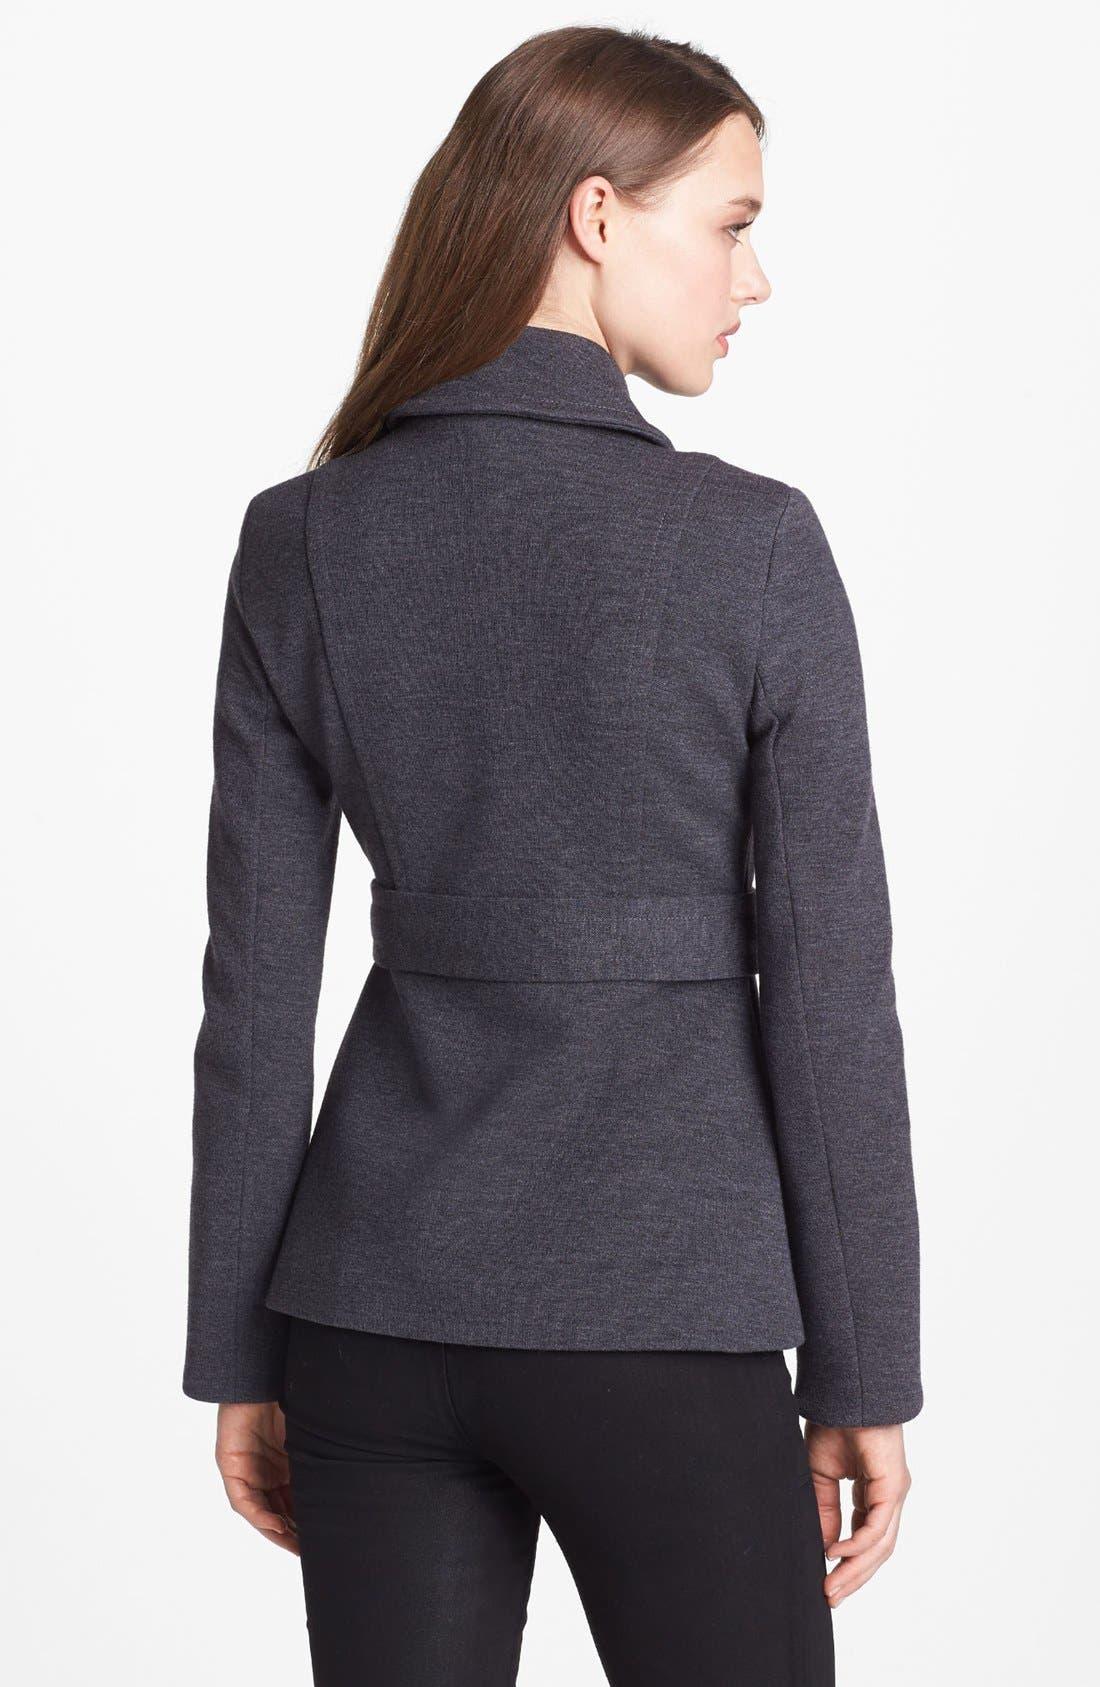 'Milly Milano' Jacket,                             Alternate thumbnail 6, color,                             020